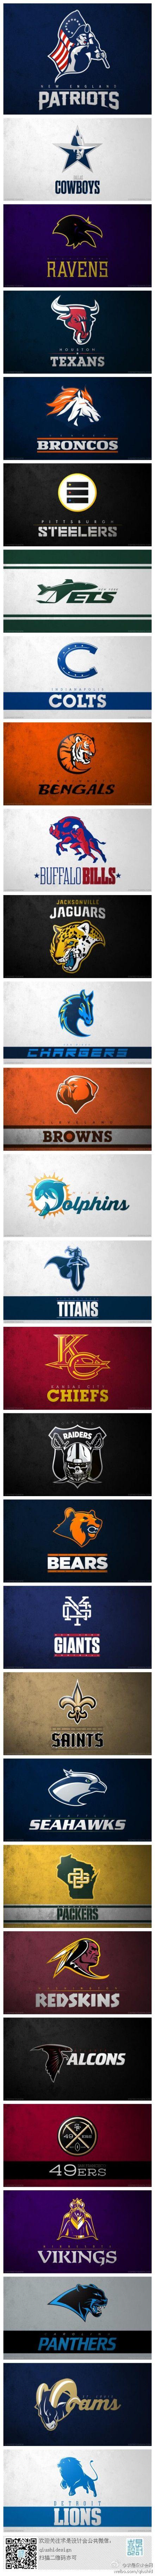 NFL logo 的重新设计。by: Max O'Brien